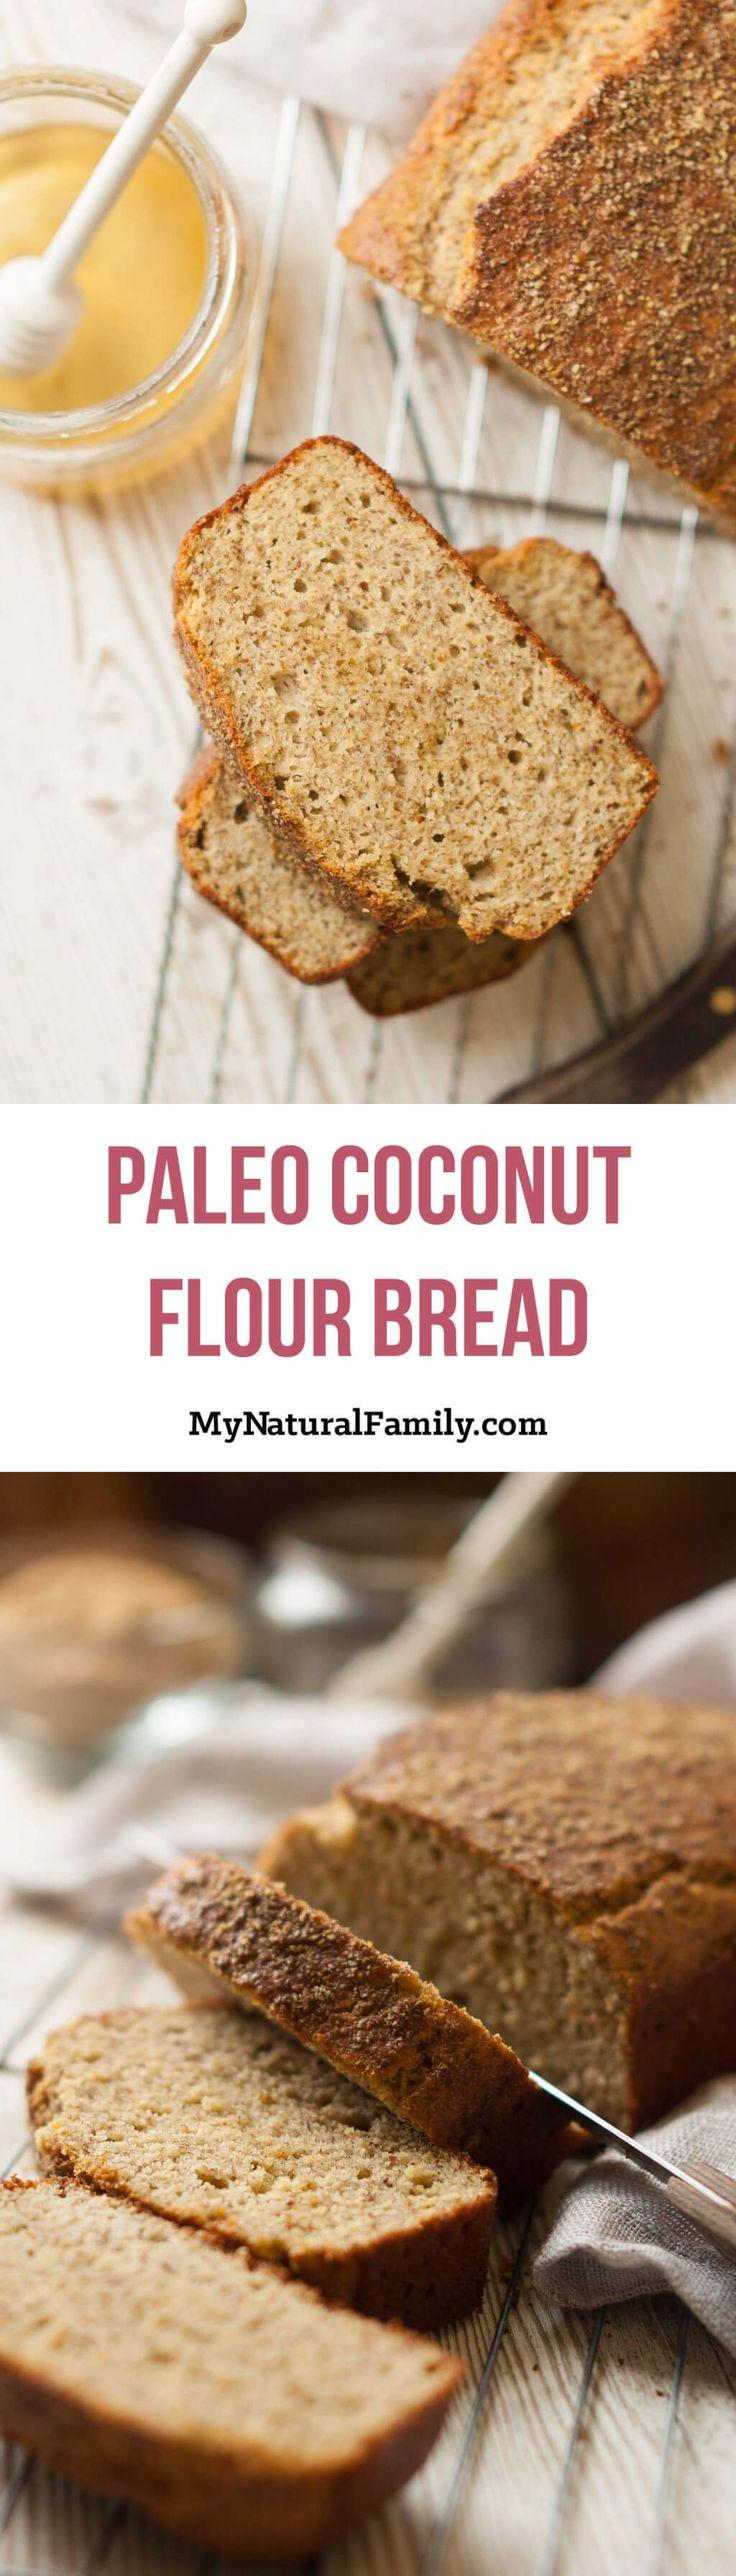 Paleo Coconut Flour Bread Recipe